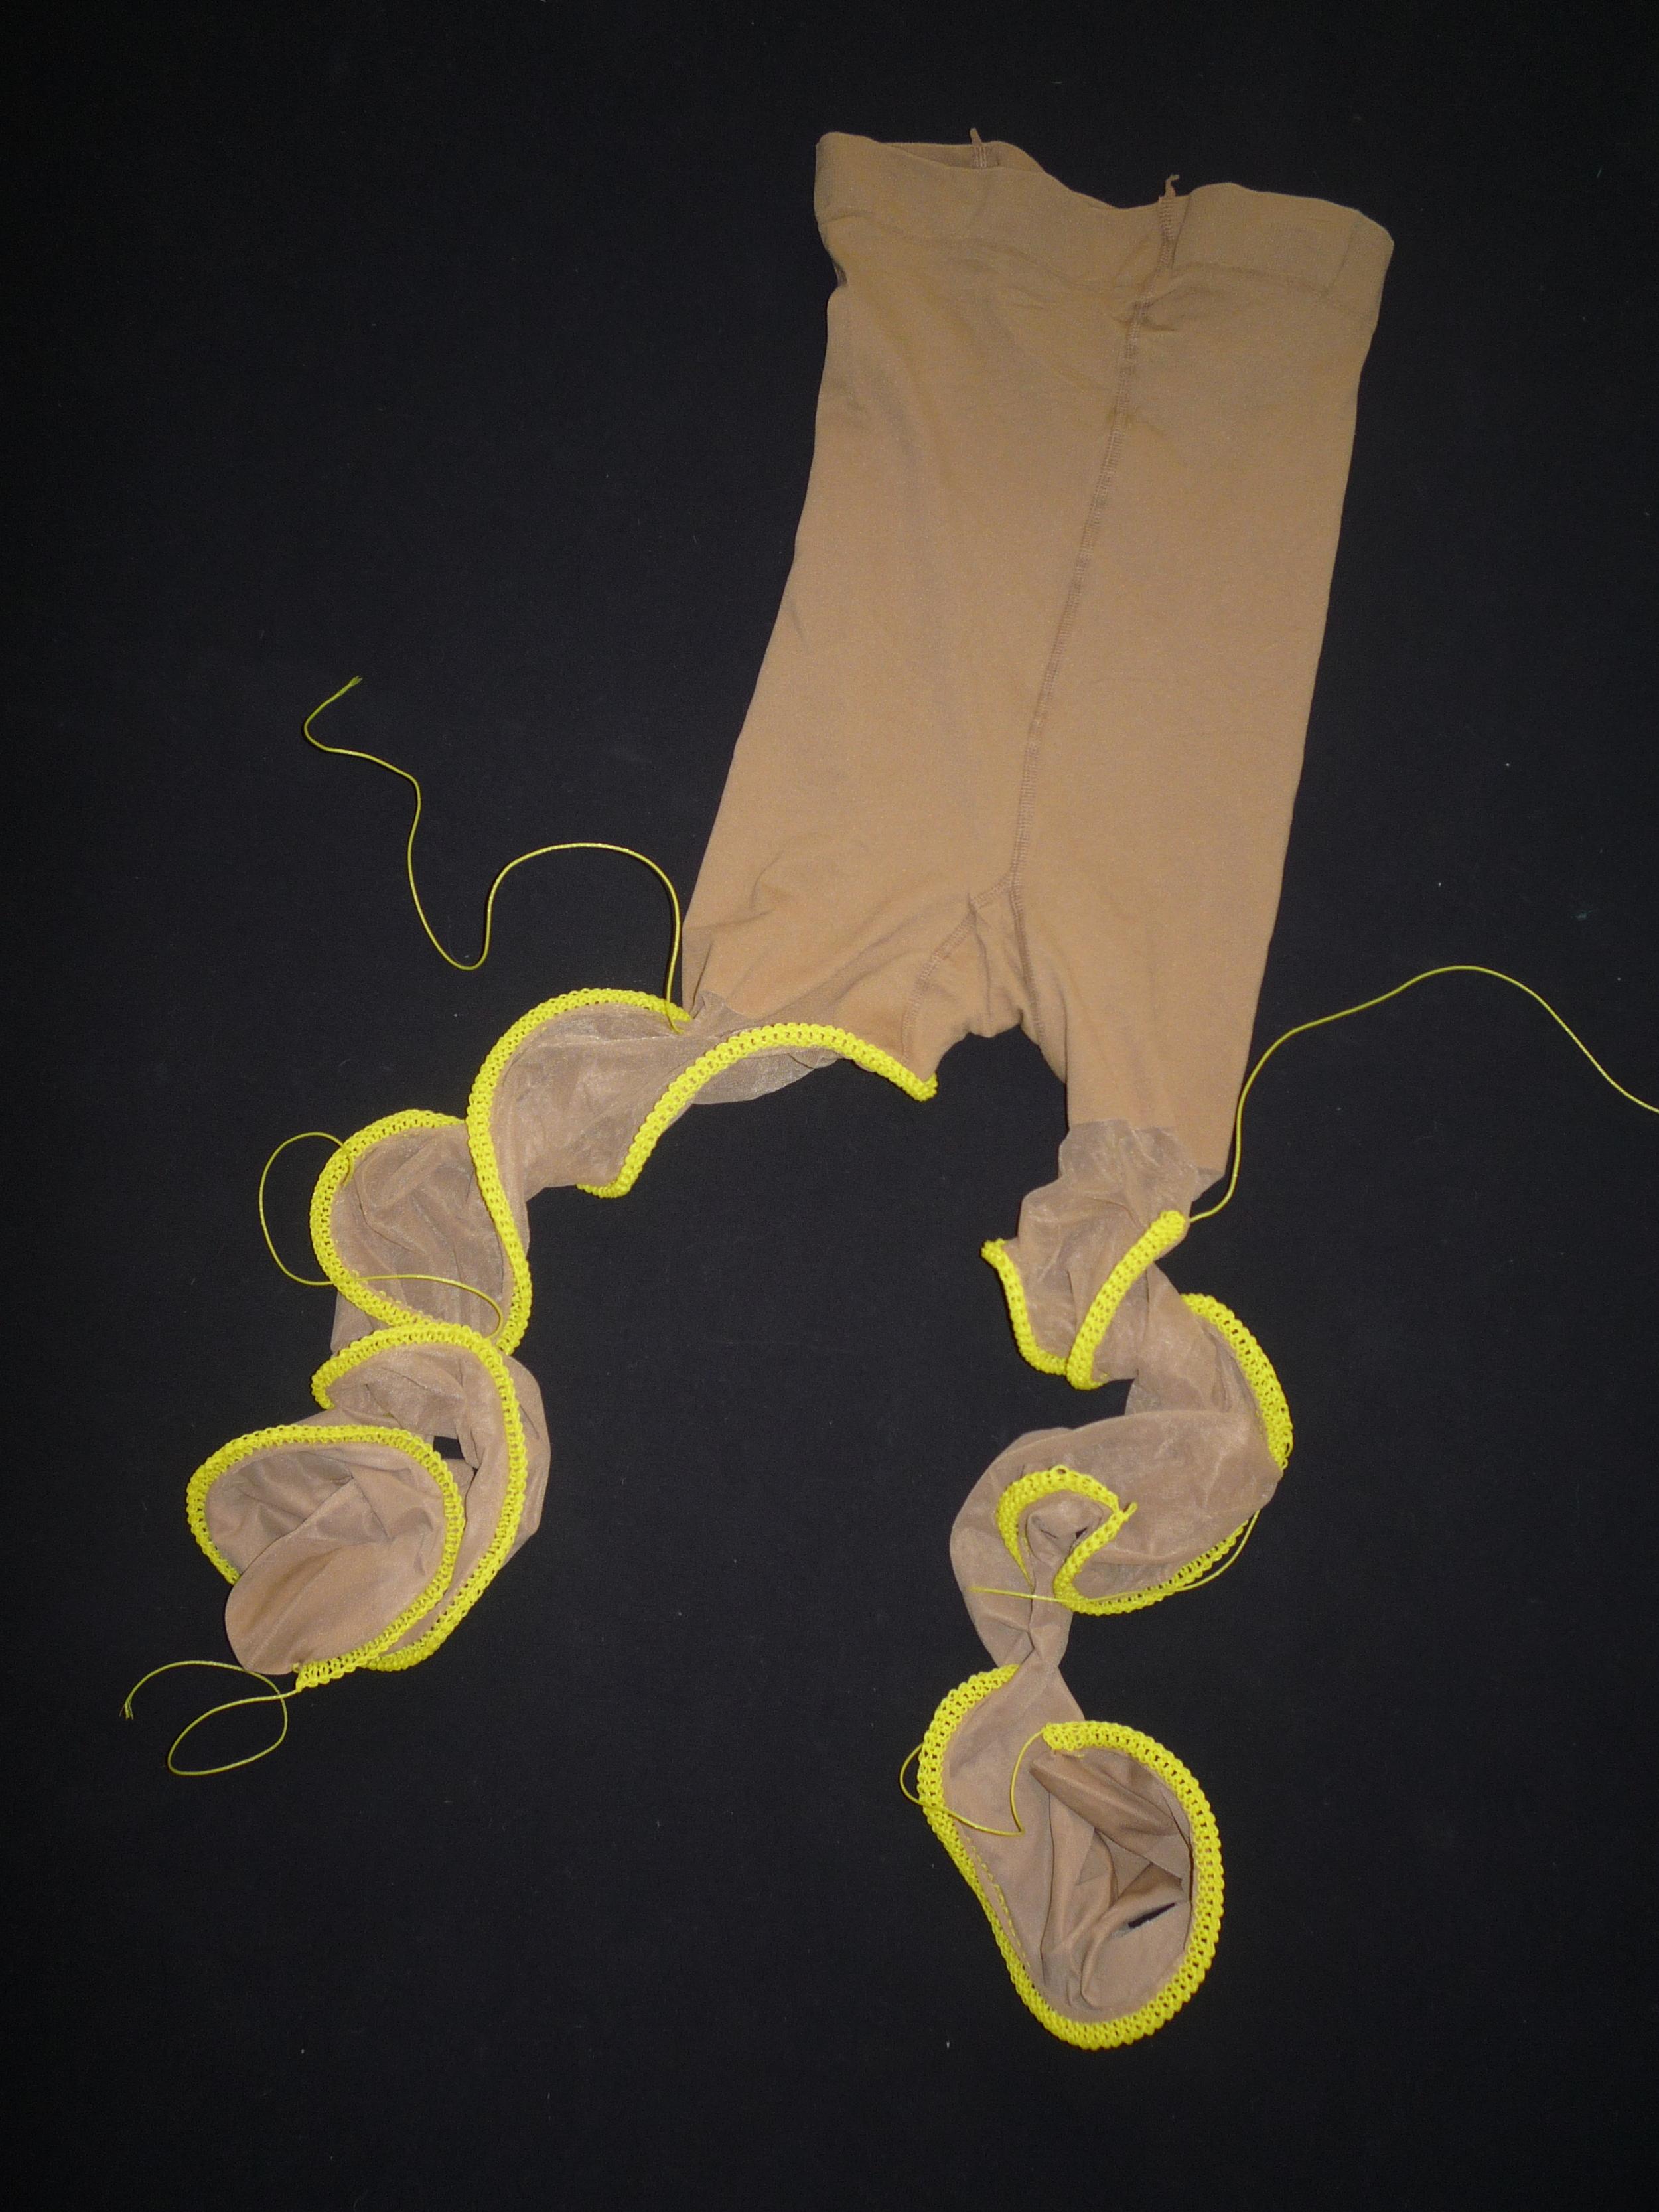 Nur Du, Nylons, cord, knitted, 109x50x3 cm